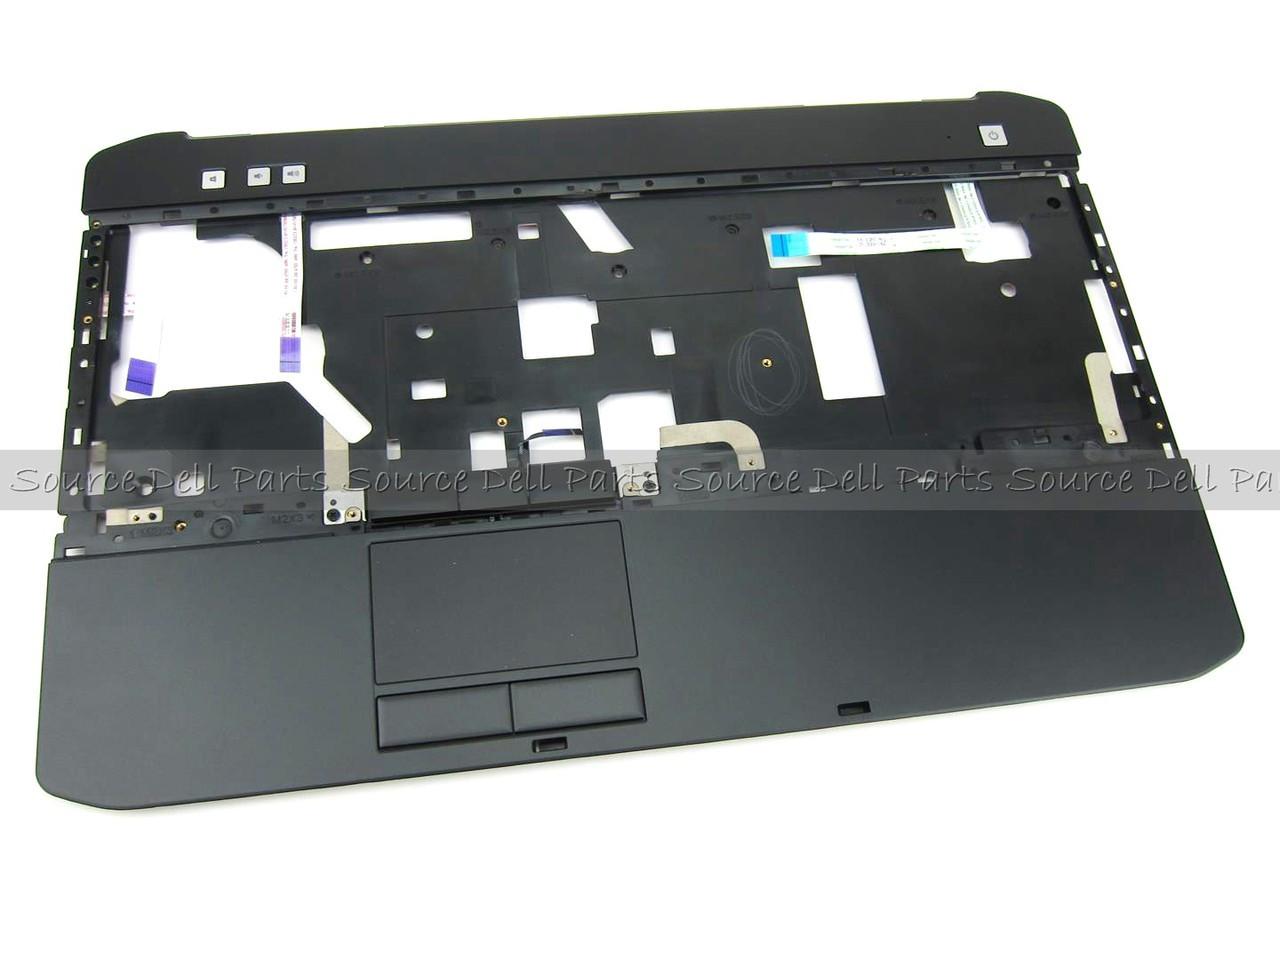 Dell Latitude E5530 Palmrest Touchpad Assembly - 7671J